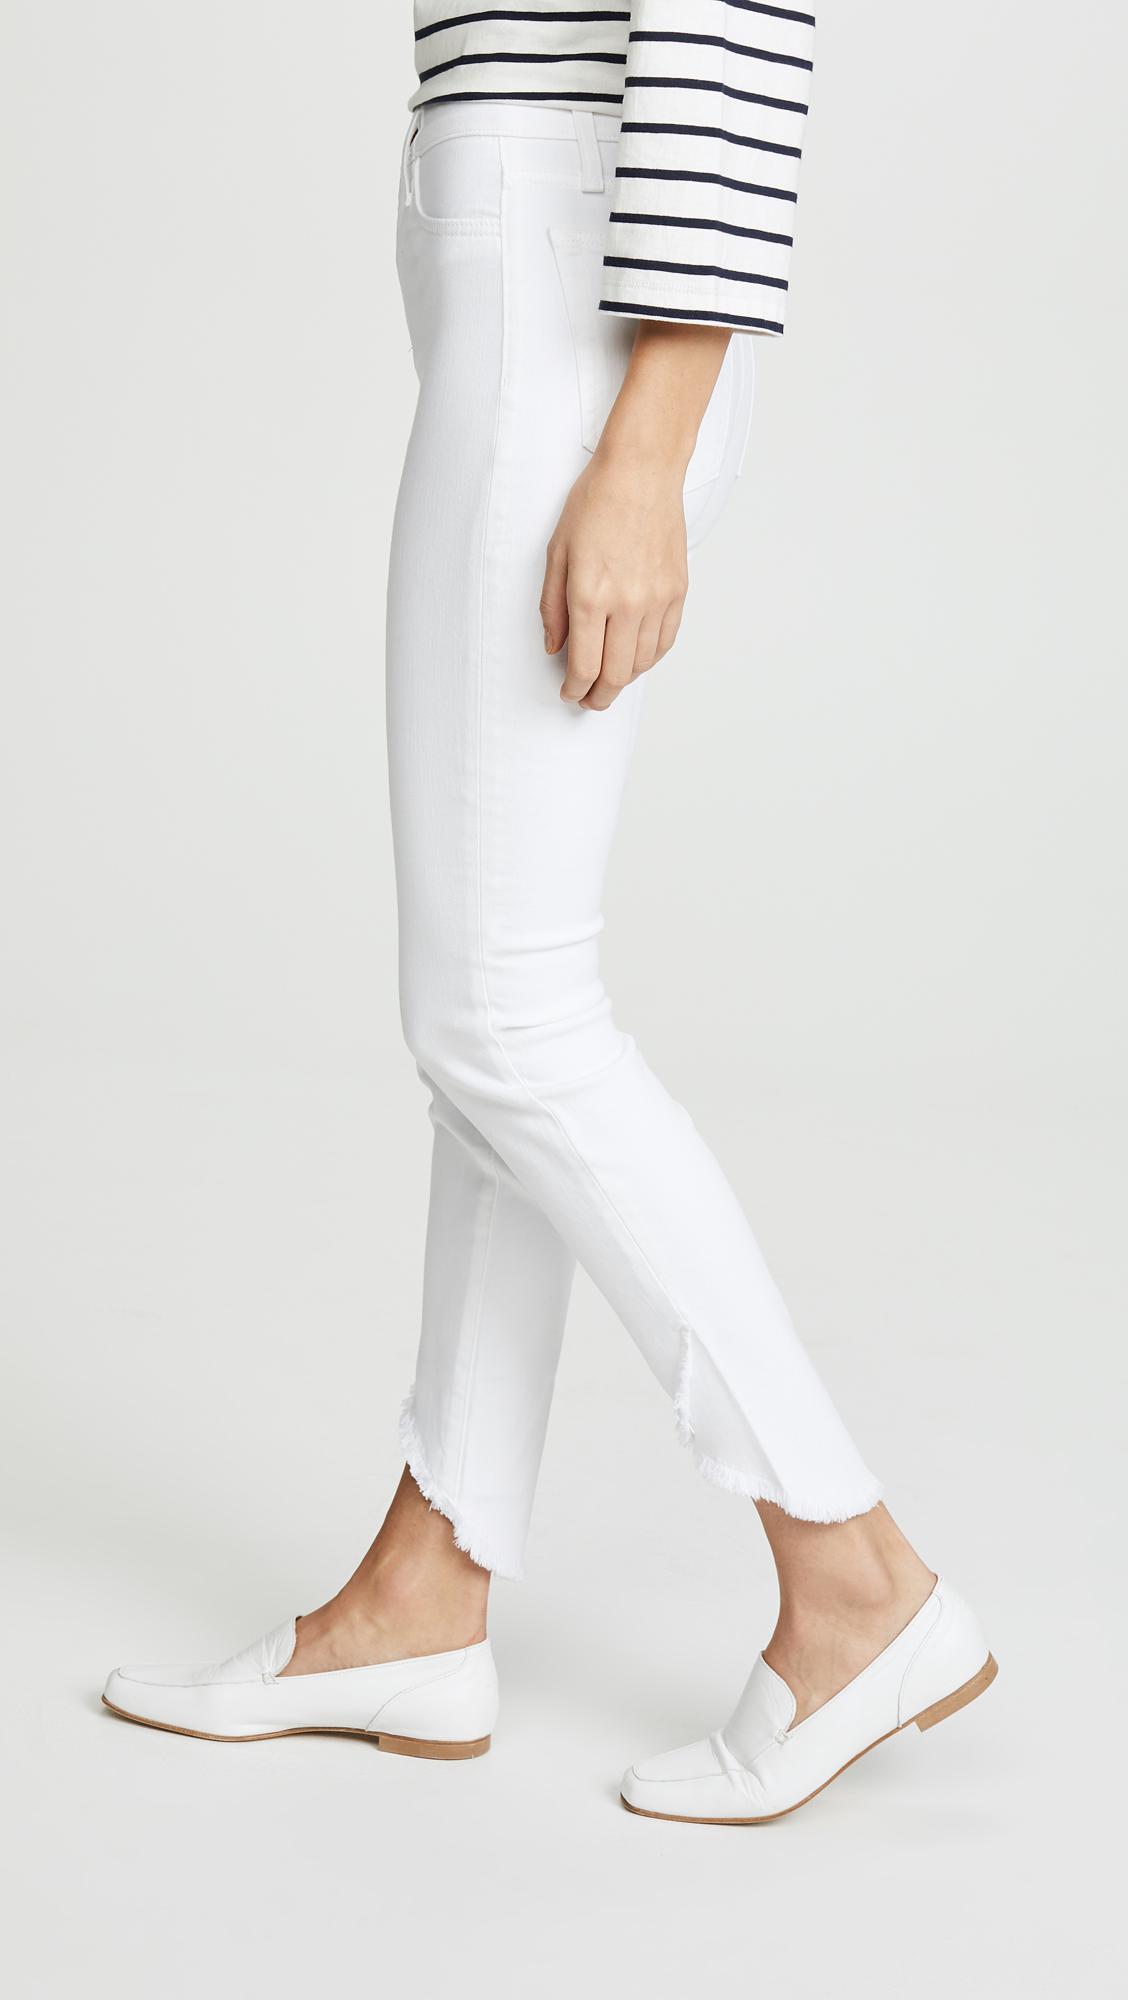 Joe's Jeans Denim Charlie High Rise Skinny Ankle With Tulip Hem Jean in White